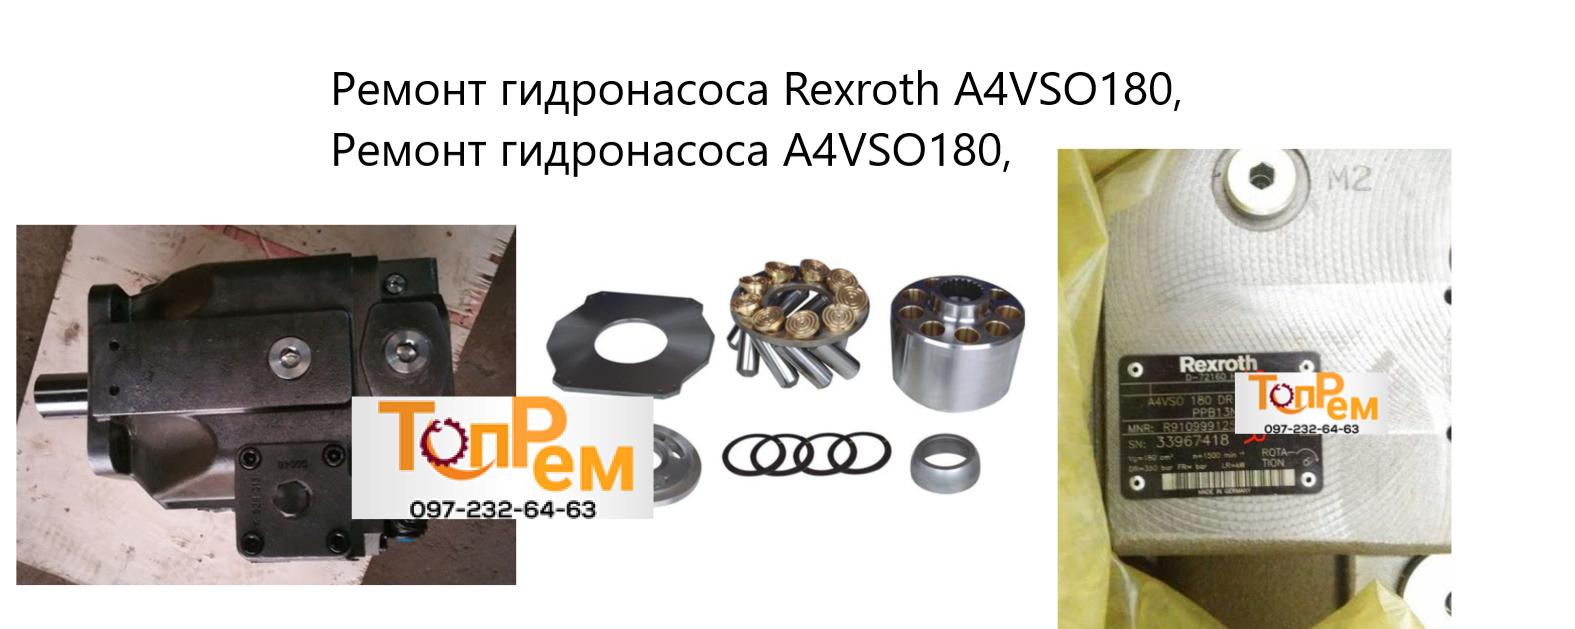 Ремонт гидронасоса Rexroth A4VSO180